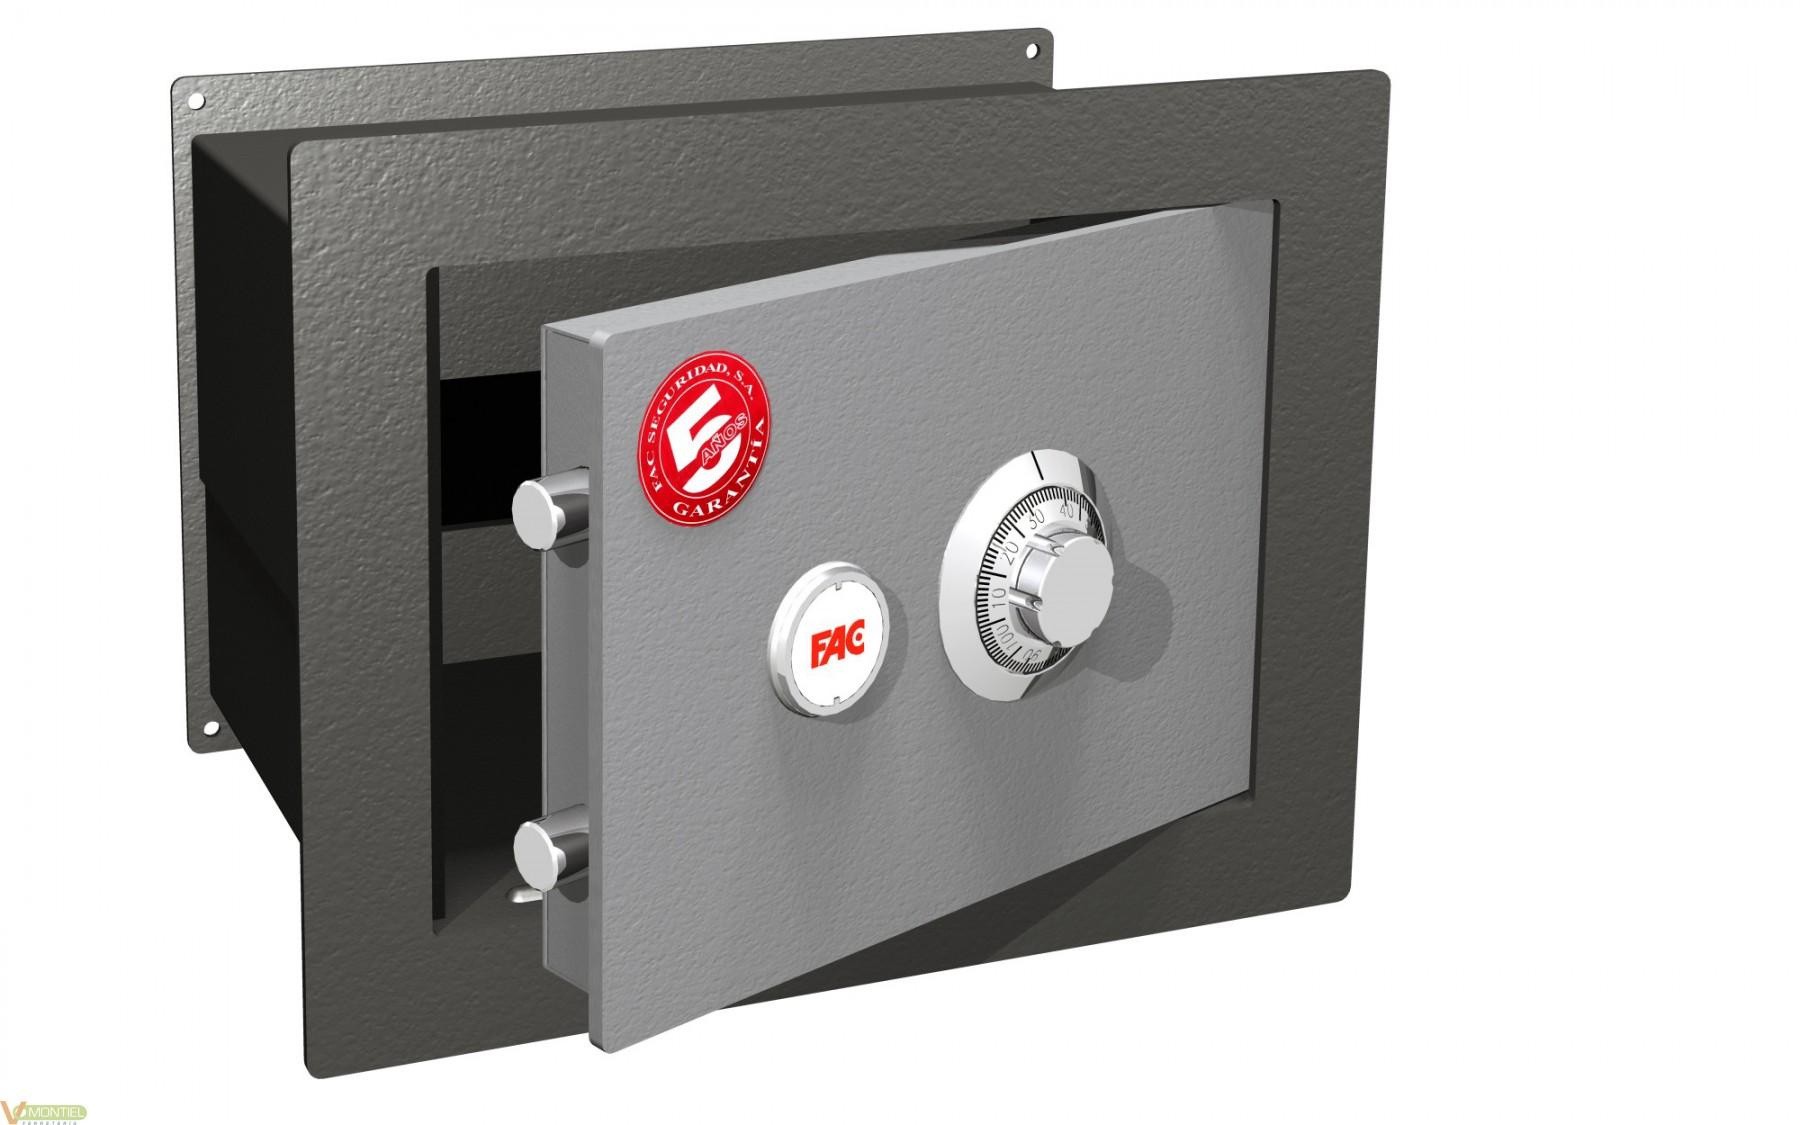 Caja fuerte emp 290x370x220mm-0